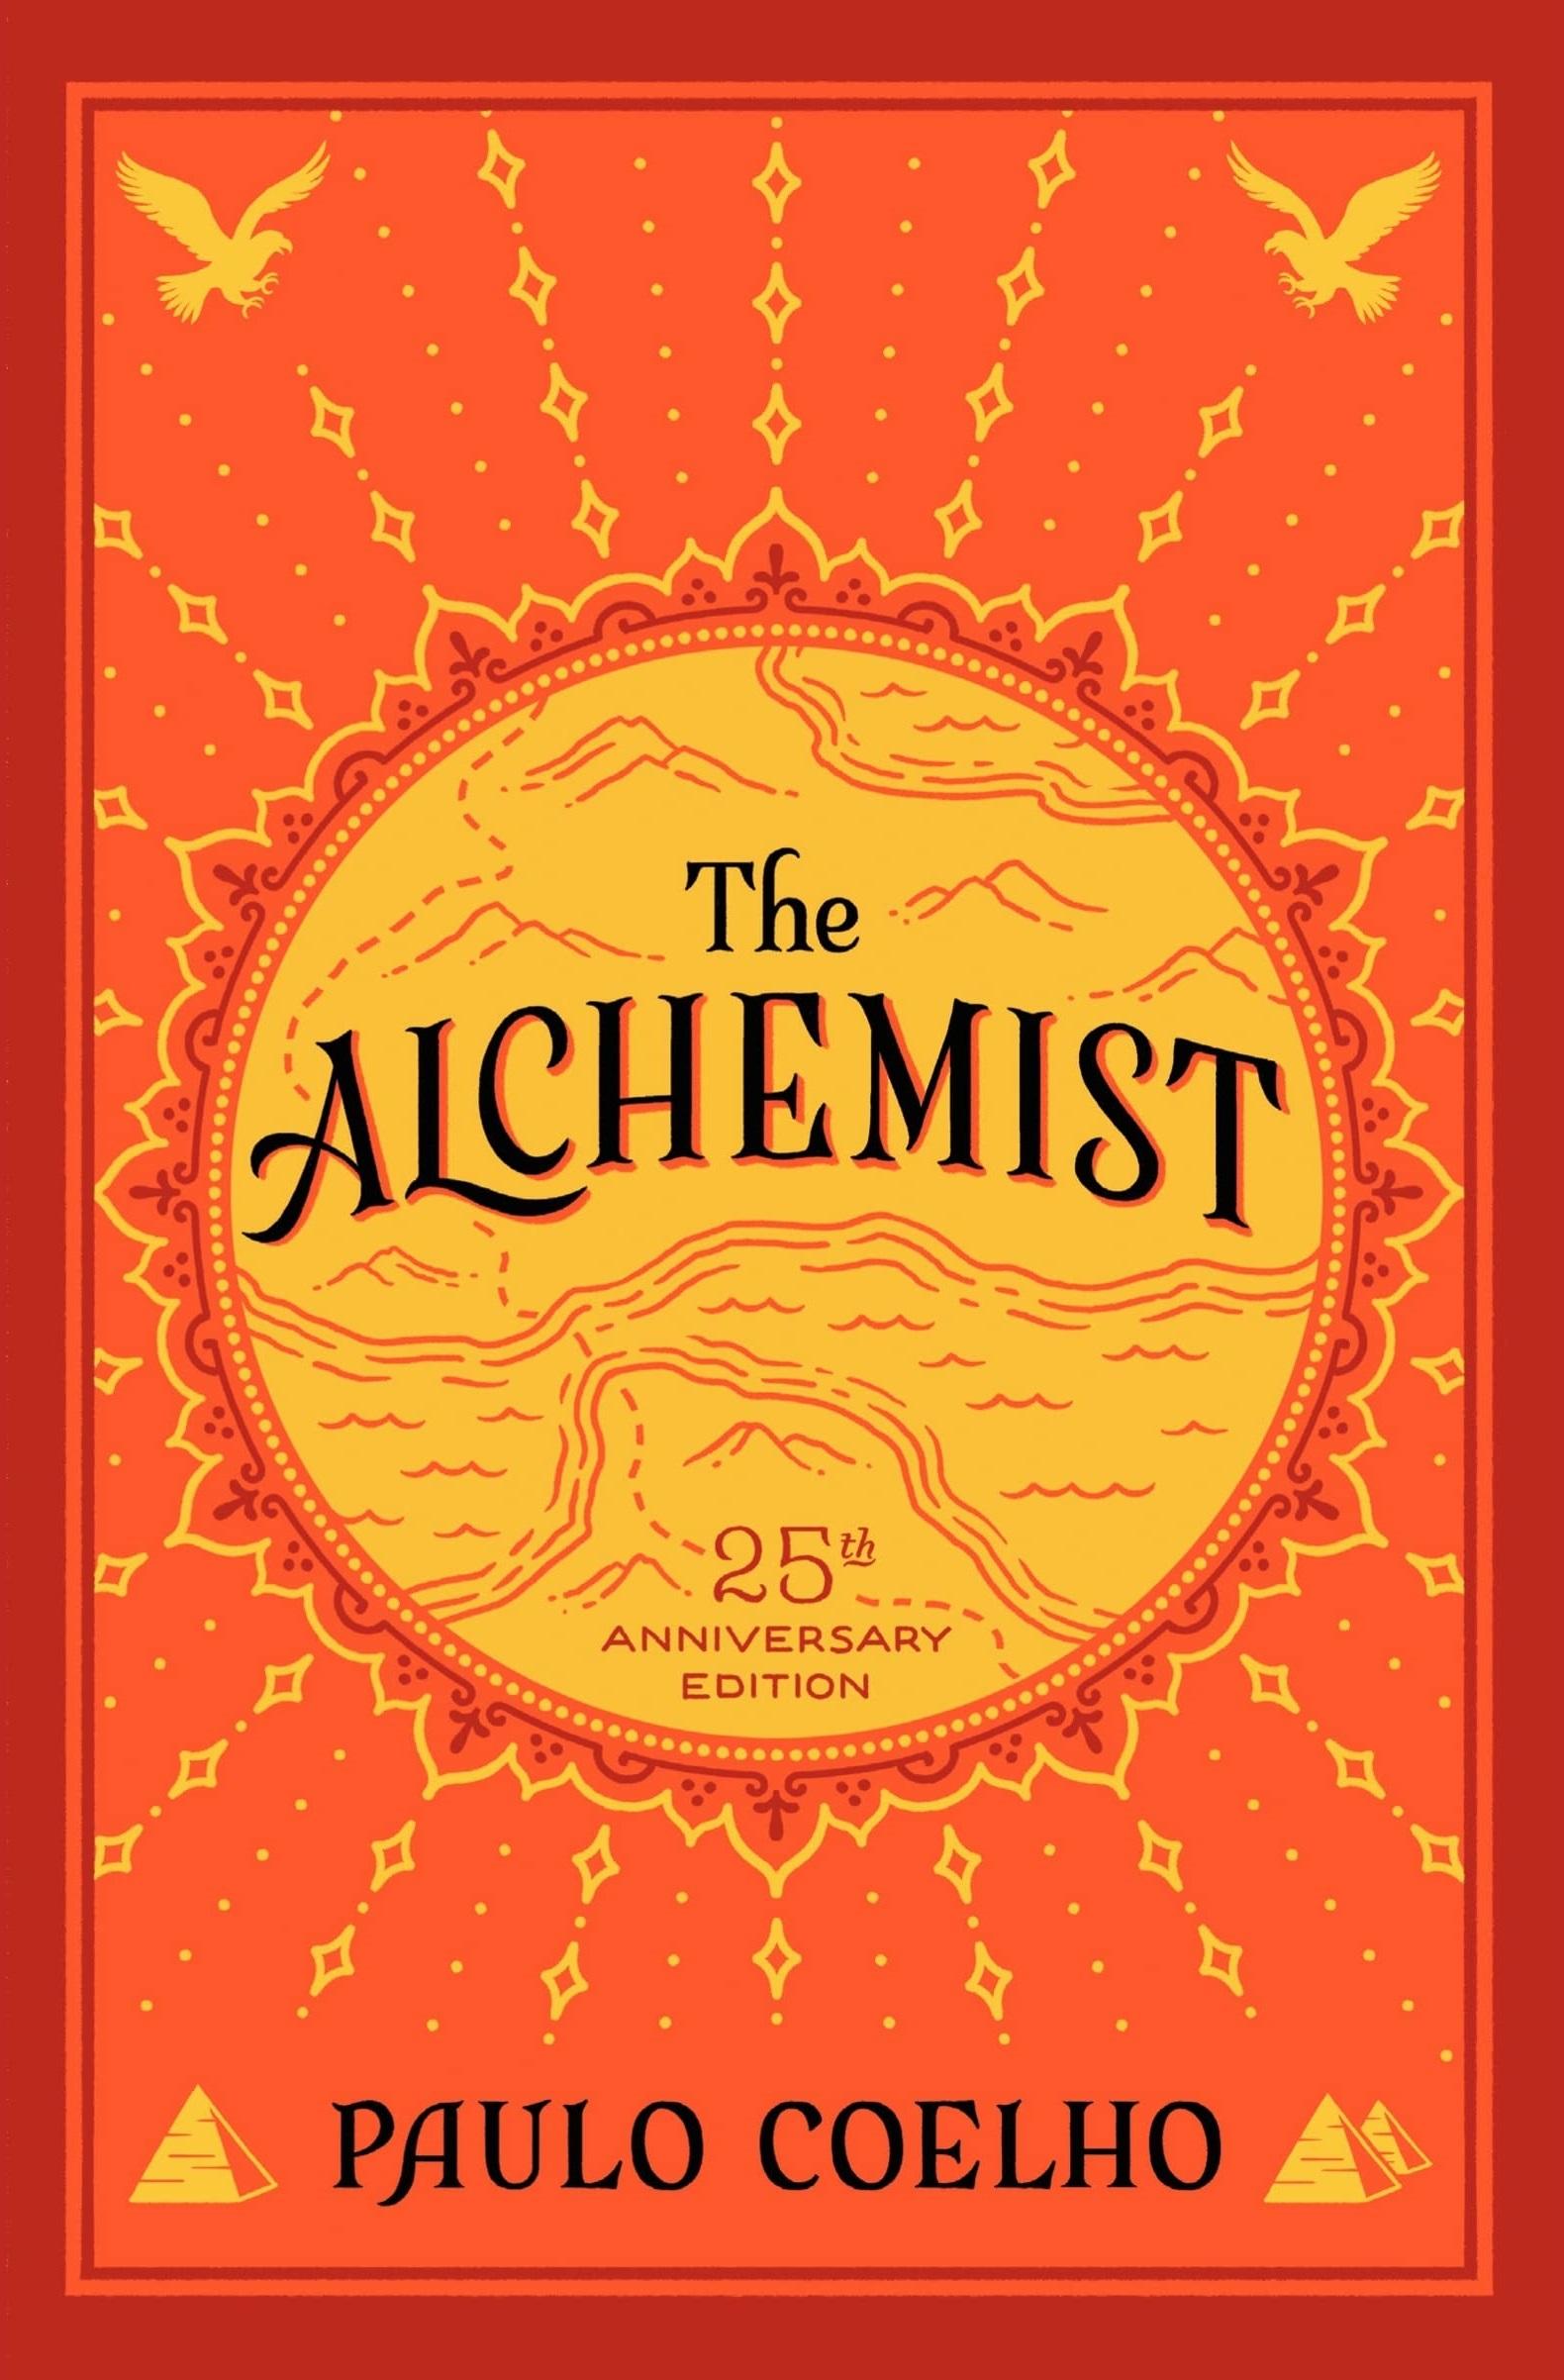 The Alchemist Best Self-Help Books